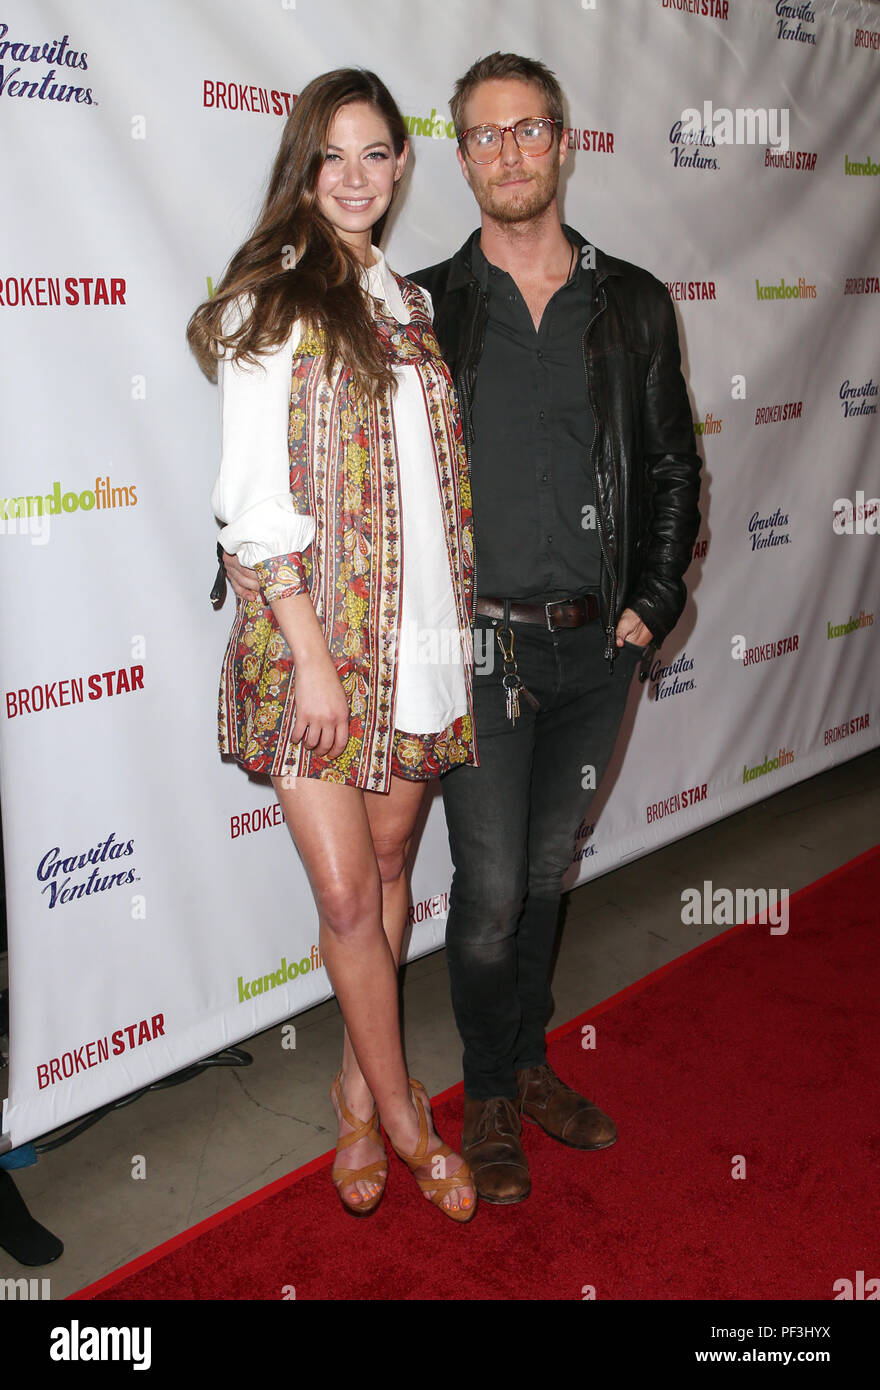 Analeigh Tipton And Jake Mcdorman